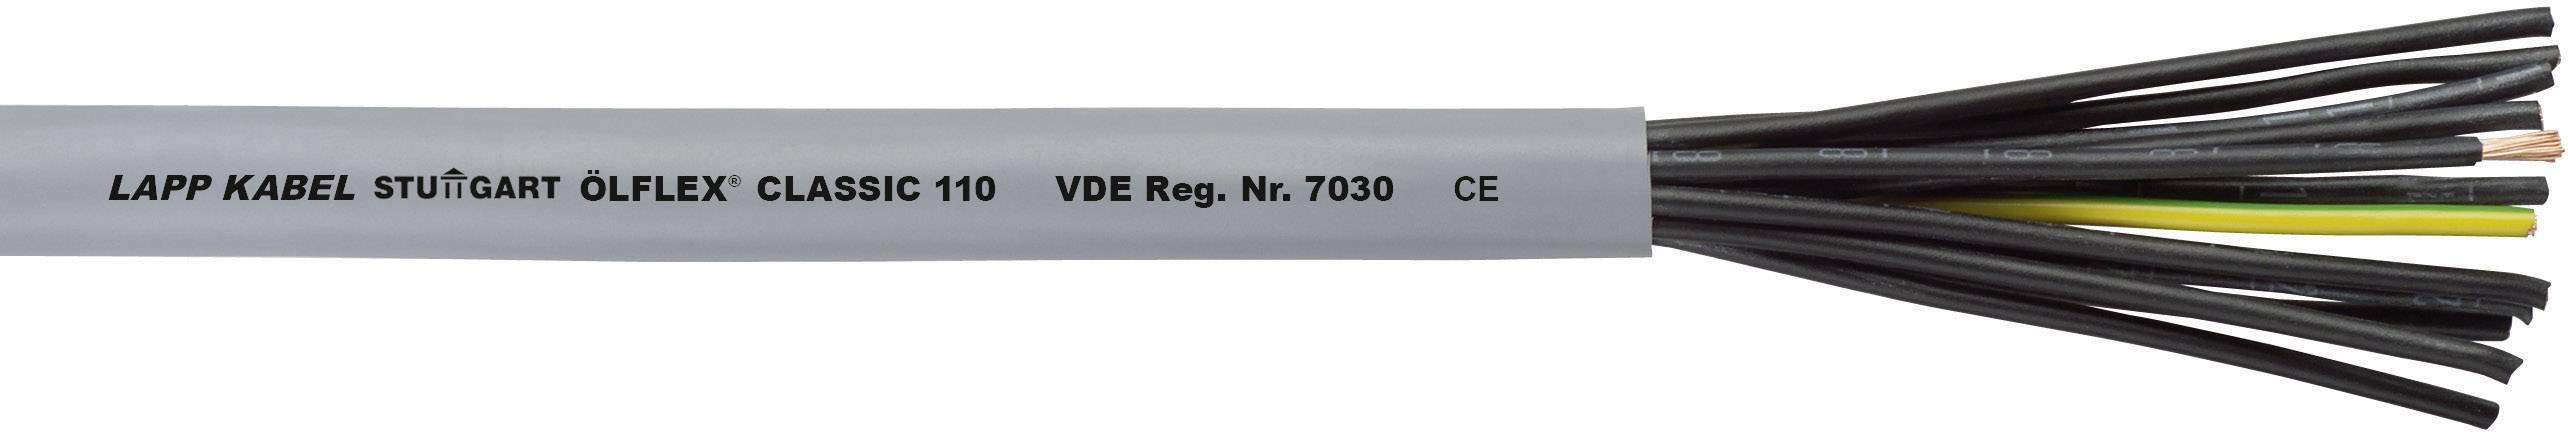 Datový kabel LappKabel Ölflex CLASSIC 110, 7 x 1,0 mm², šedá, 1 m